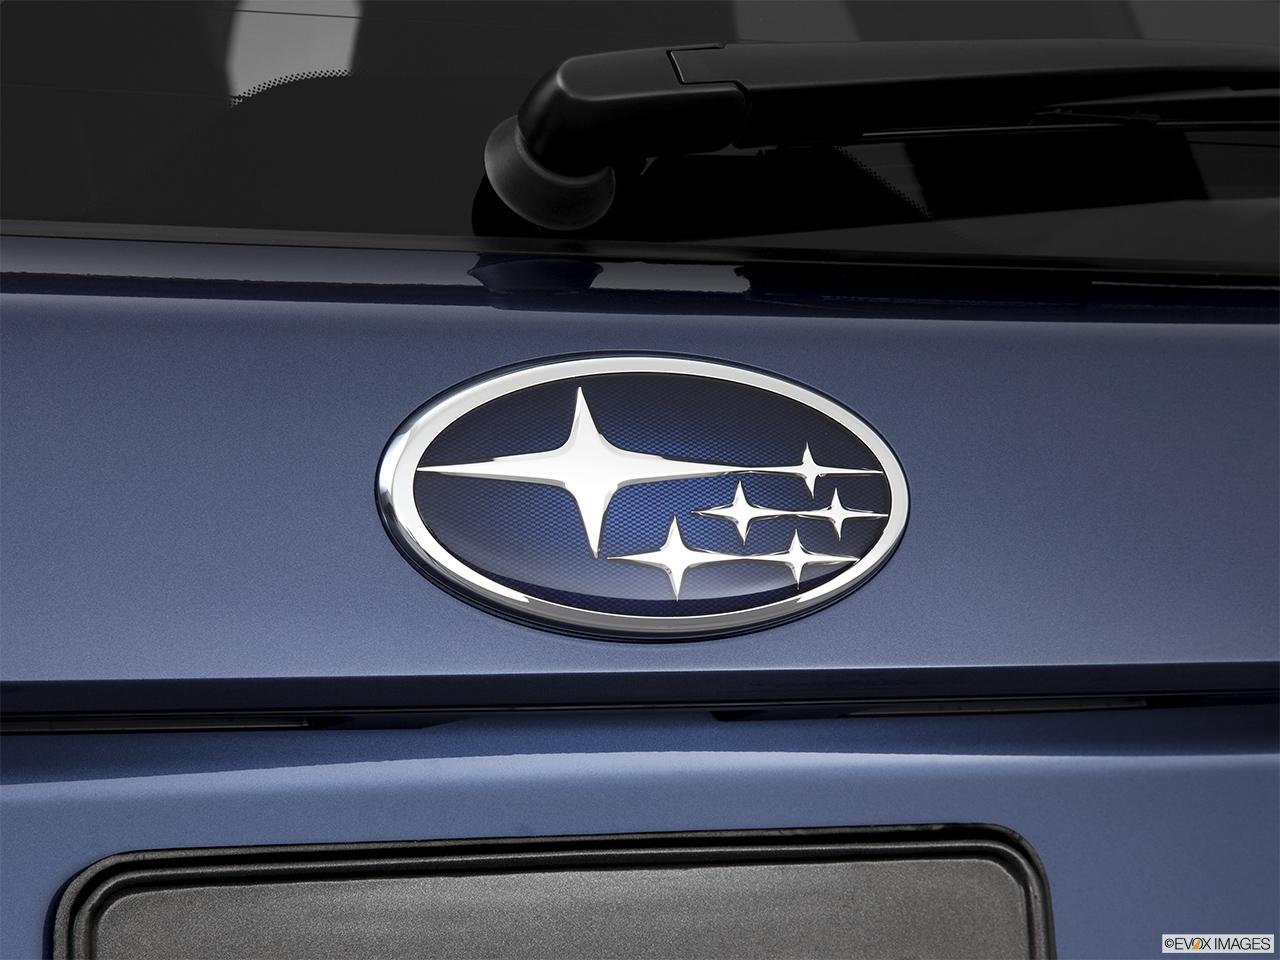 ... Forester Automatic 2.0XT Premium - Rear manufacture badge/emblem: https://carnow.com/cars/5546/mdp_photo_thumbnails